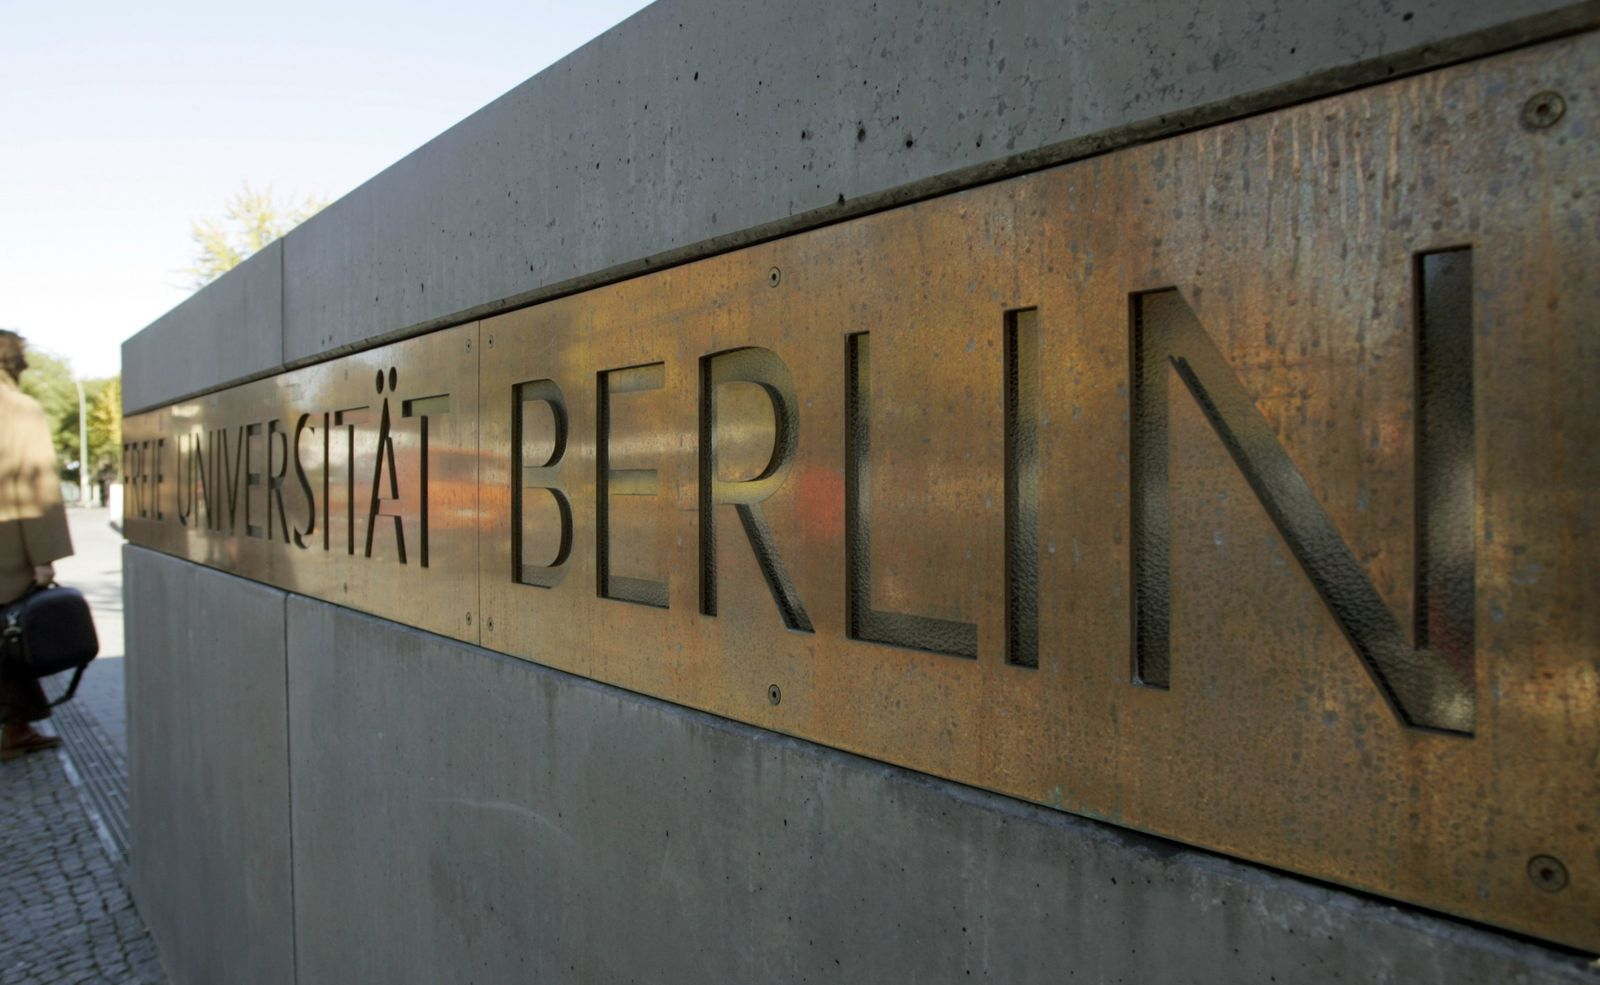 Ringen um Elite -Status - Freie Universität Berlin